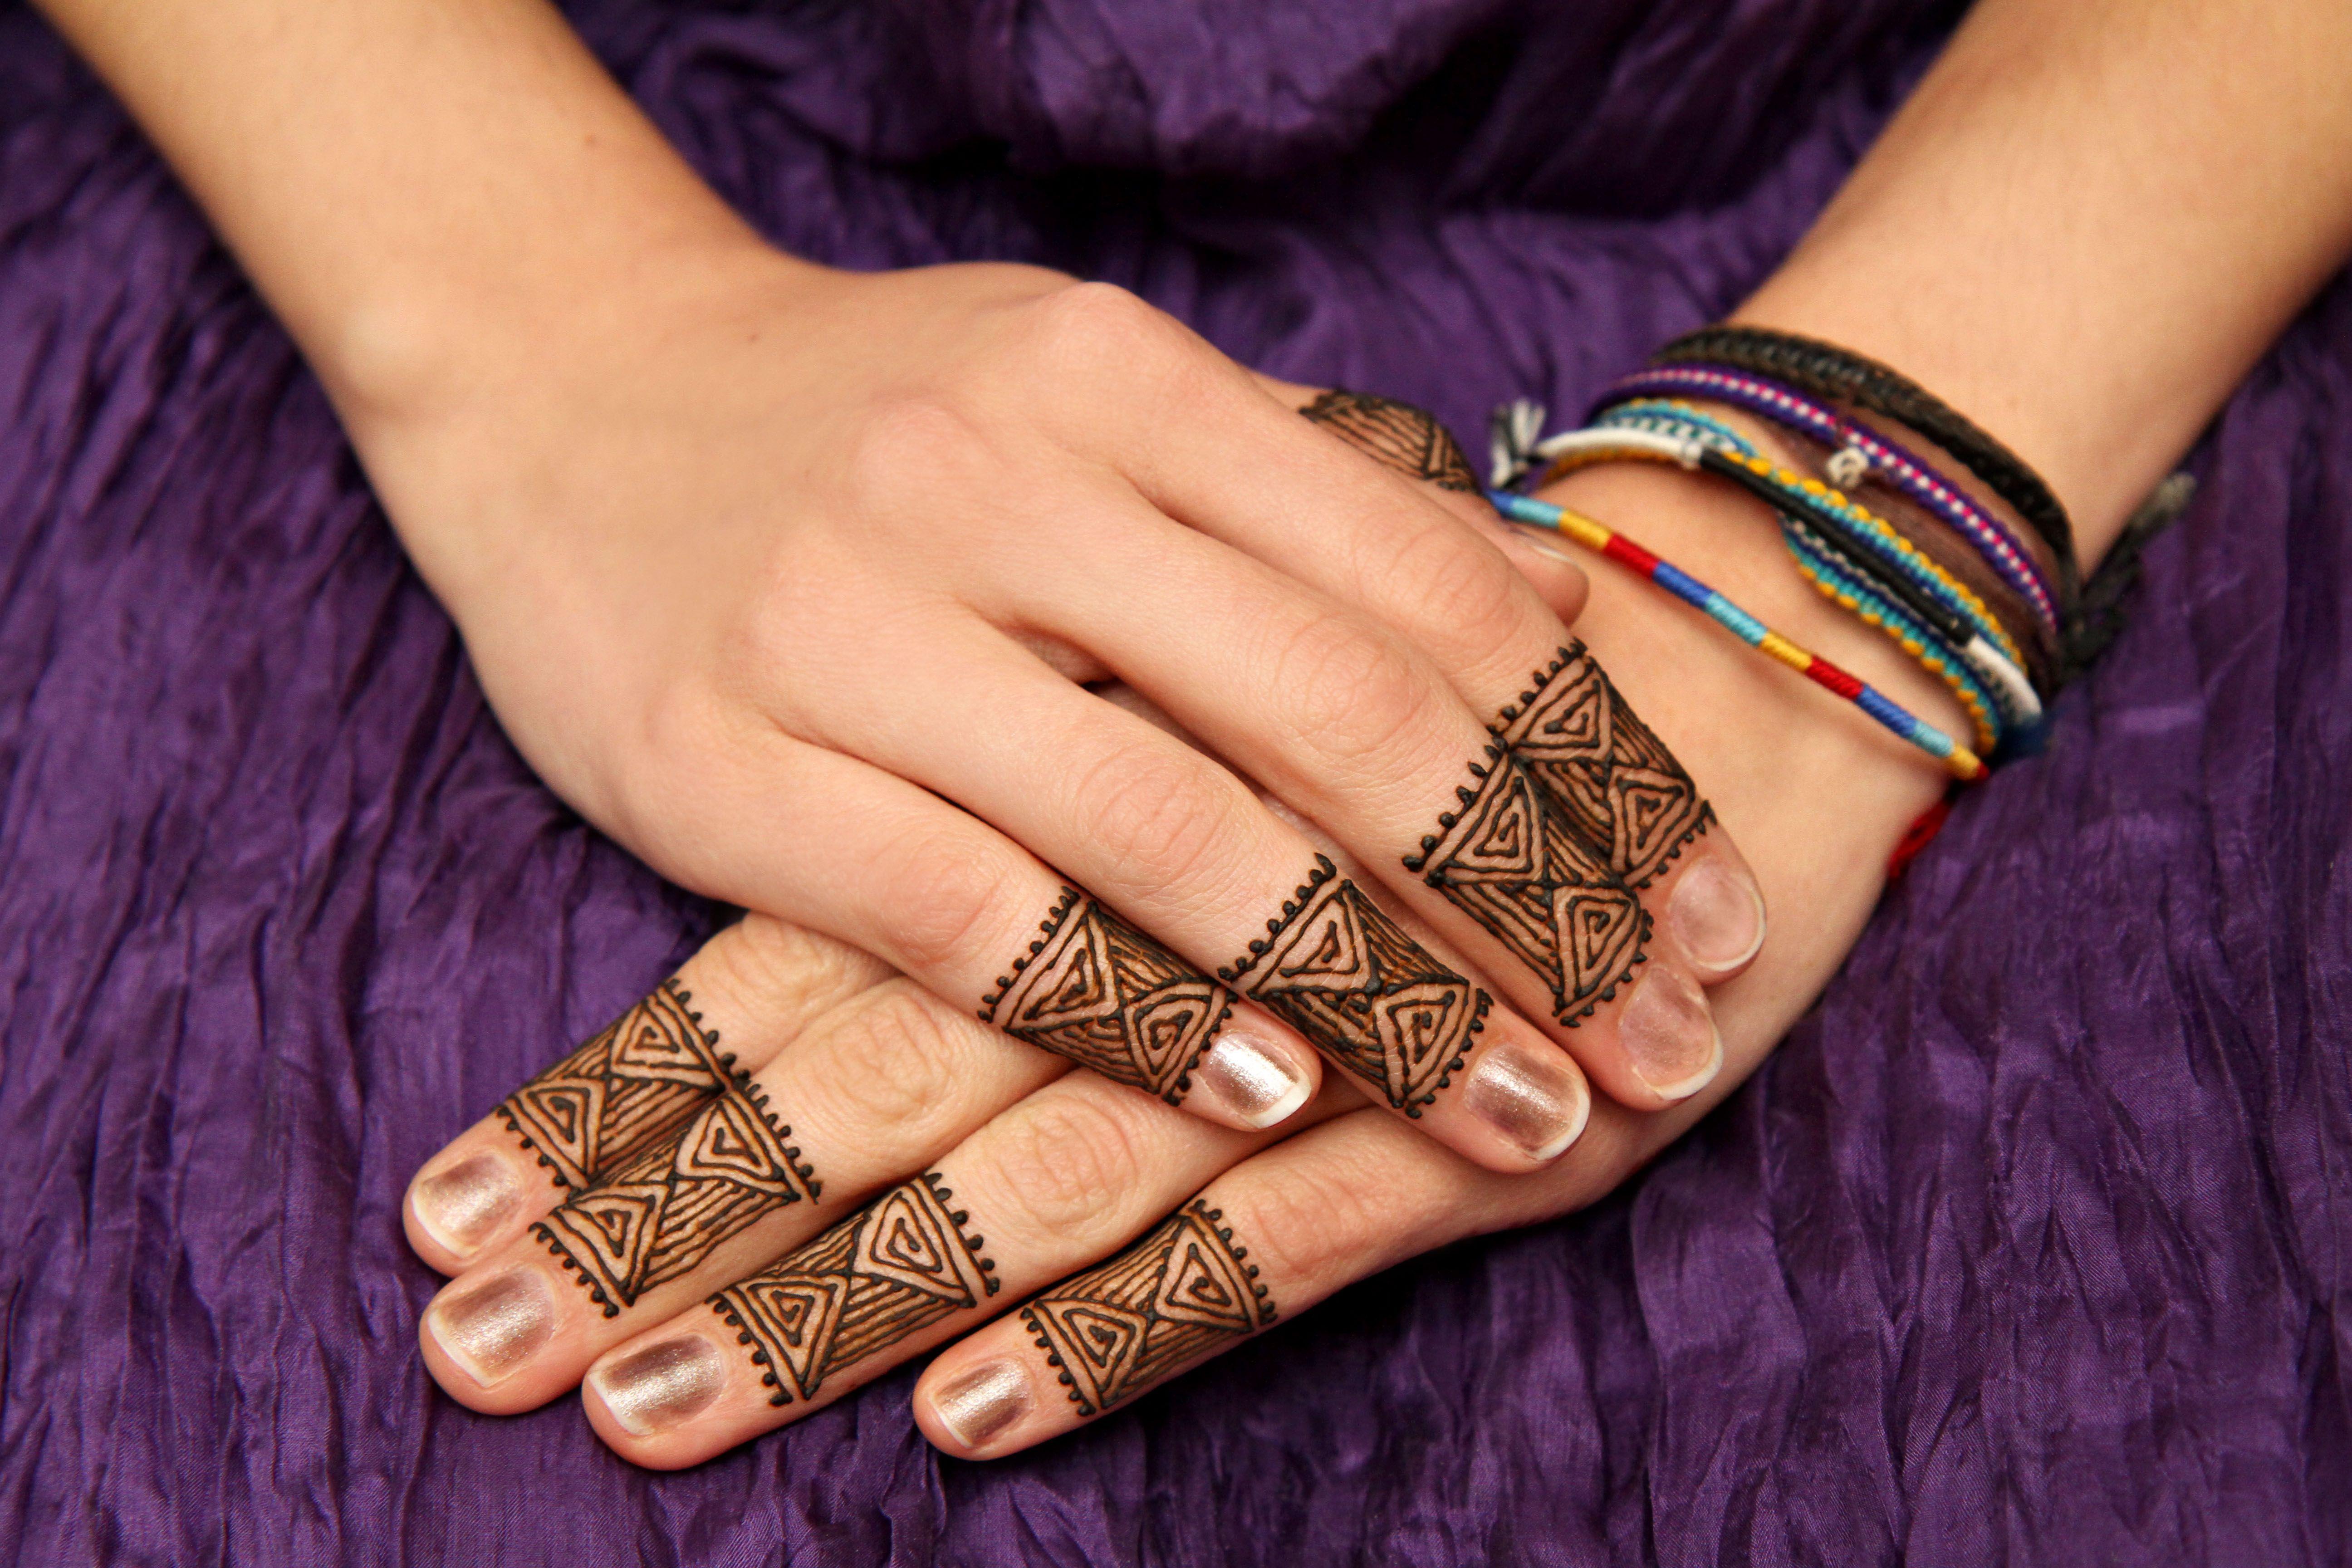 Henna Tattoo Montreal : Alliebee henna fingertips fingers hands mehndi montreal quebec